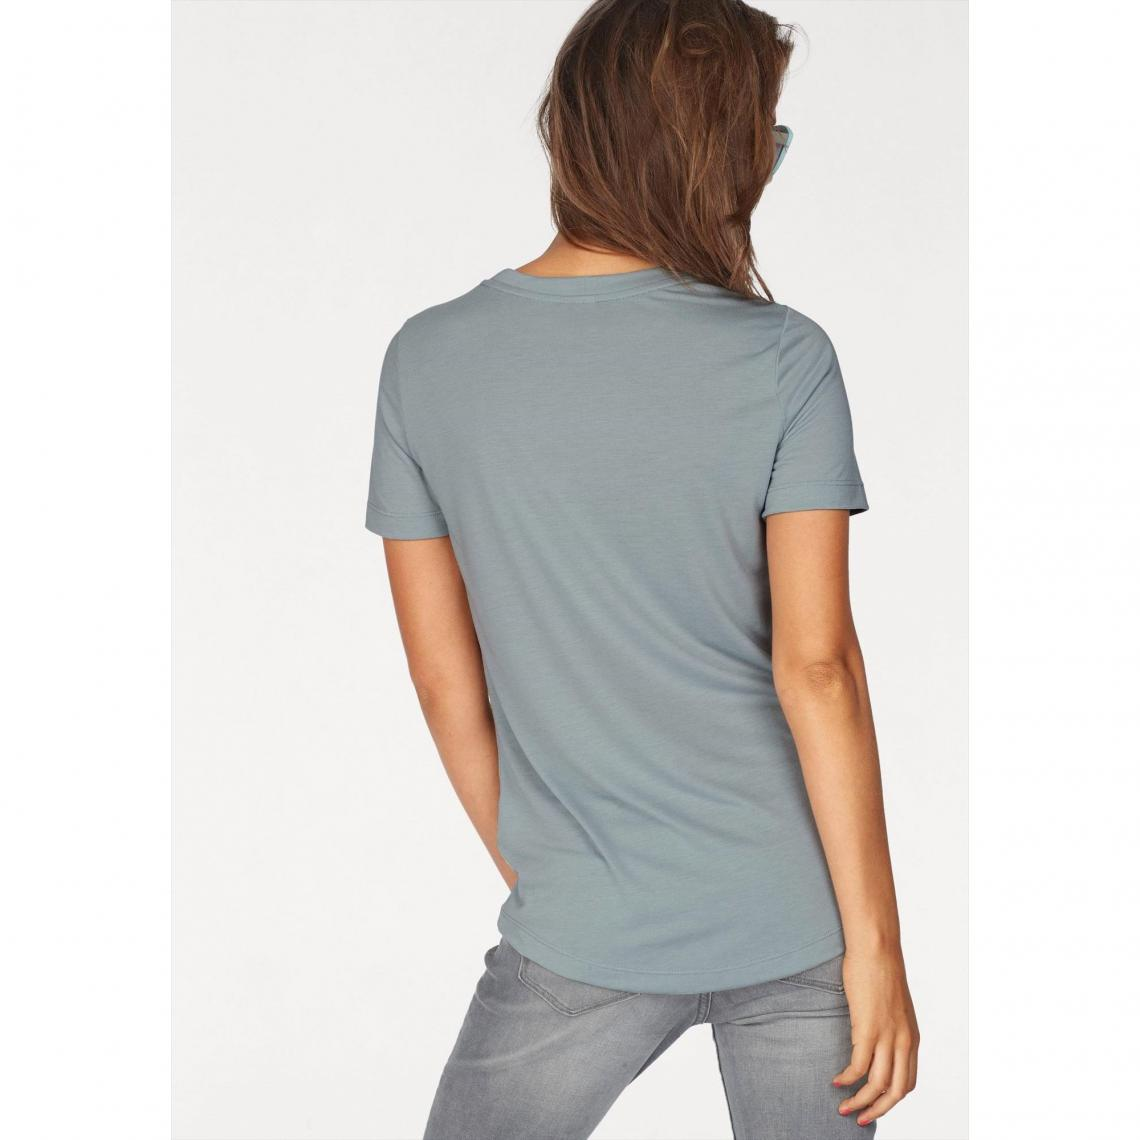 22f2127797a0e T-shirt col rond manches courtes femme Essential Nike Sportswear - Bleu Ciel